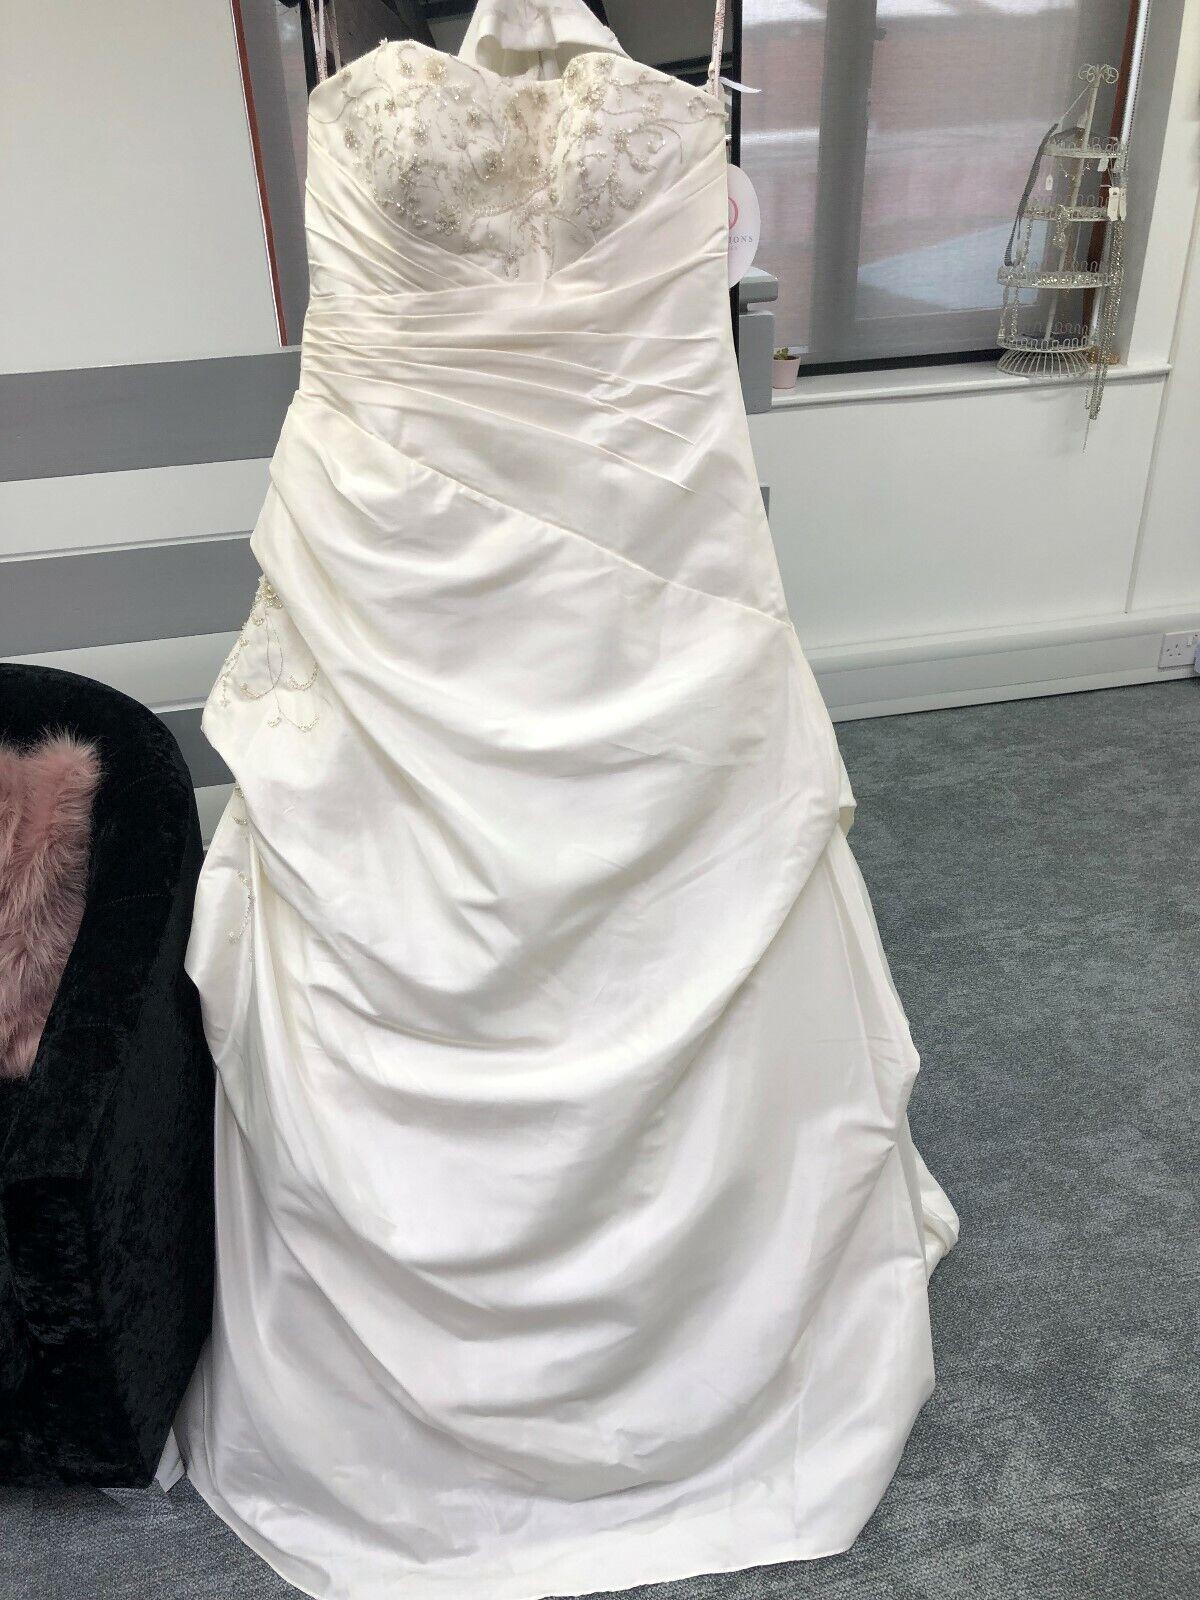 28.Veromia Wedding Dress VR6963 UK16 Ivory tafetta